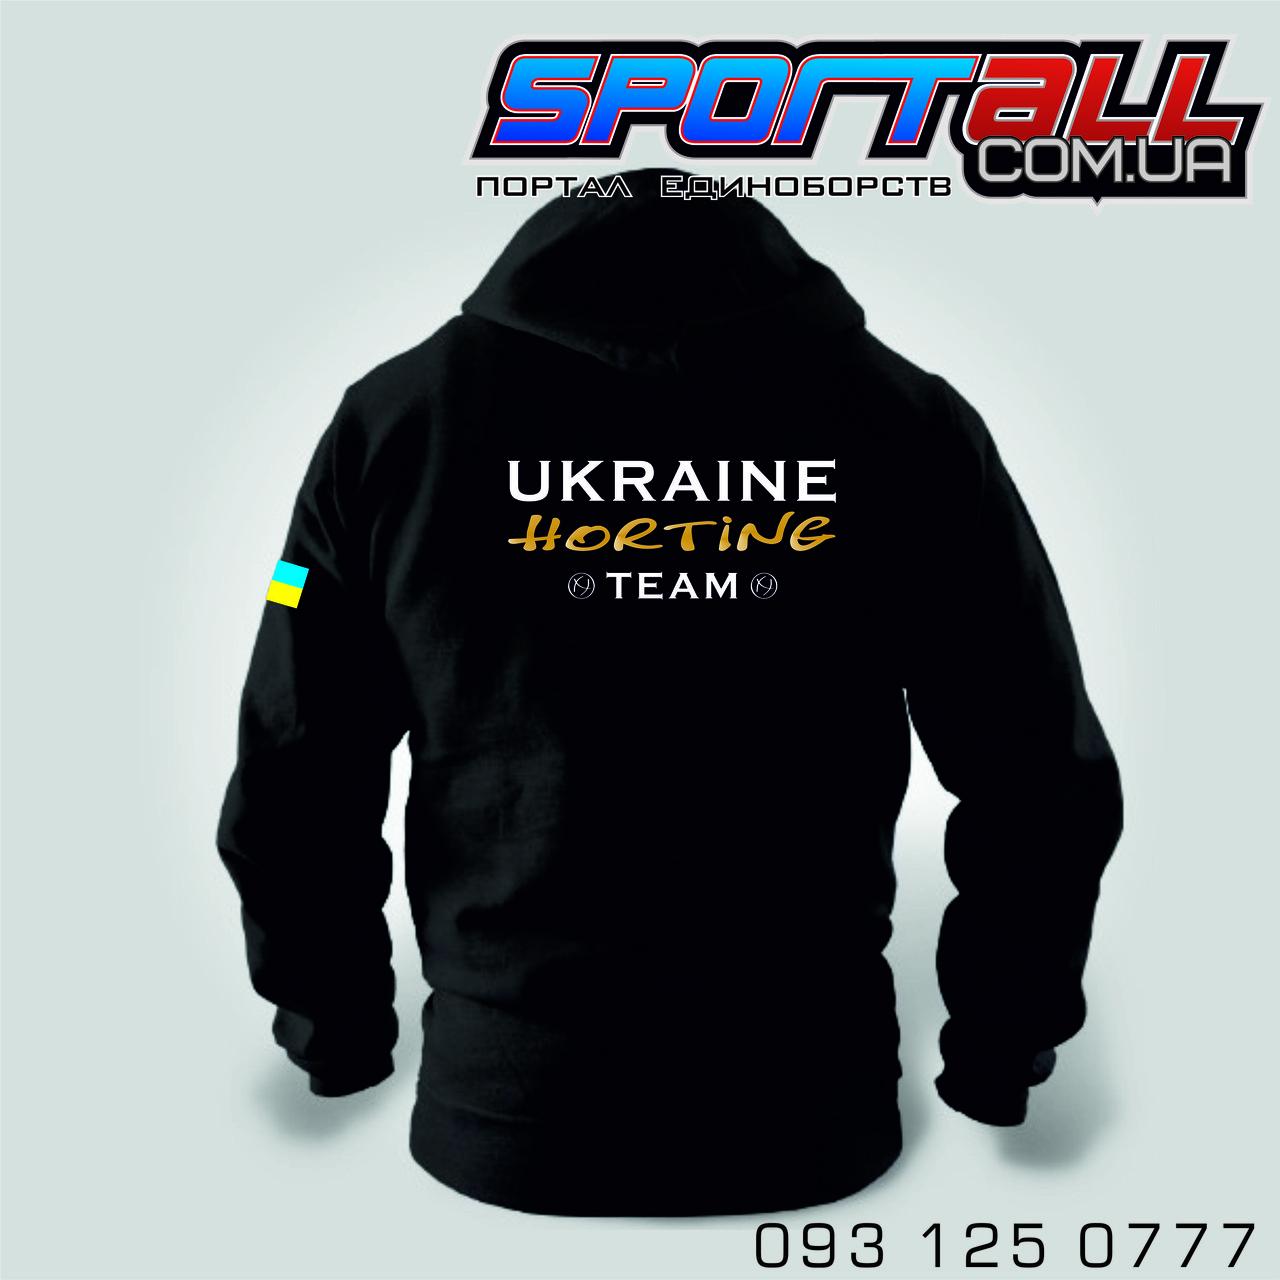 Sportall.com.ua  Хортинг, хортінг, horting Спортивный костюм сборной ... 87ef12d3f7f